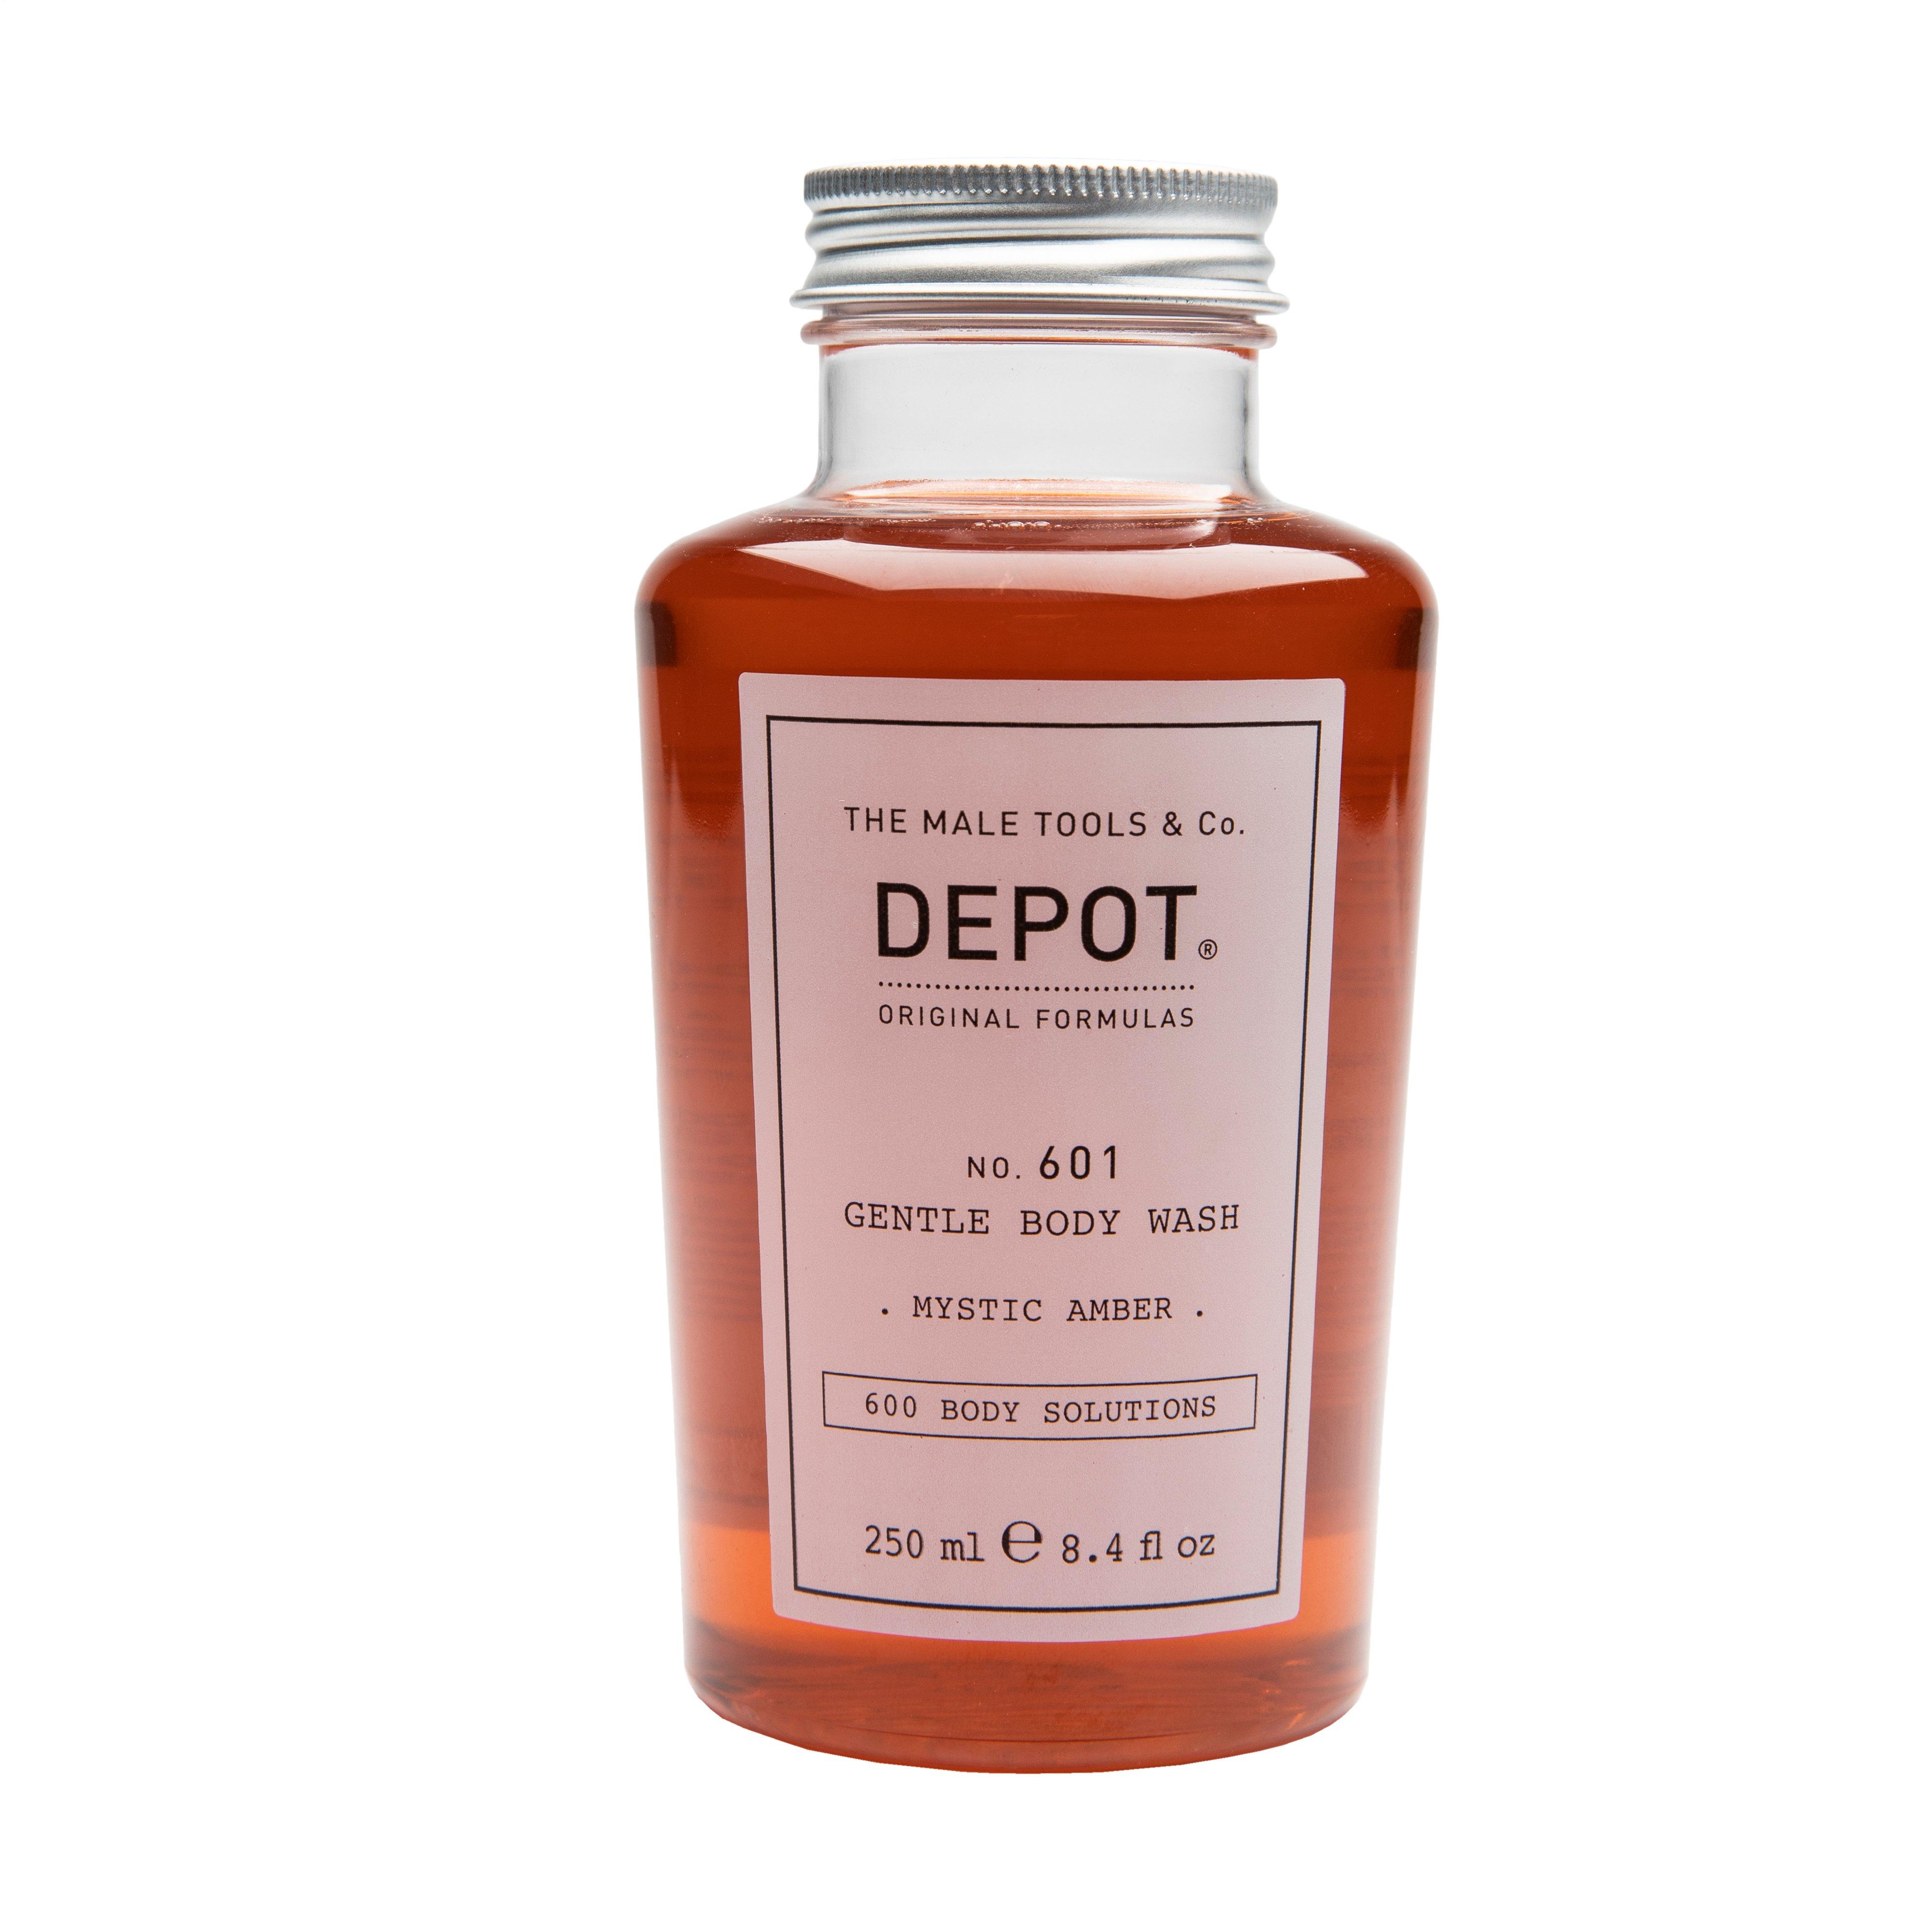 Depot - No. 601 Gentle Body Wash Mystic Amber 250 ml